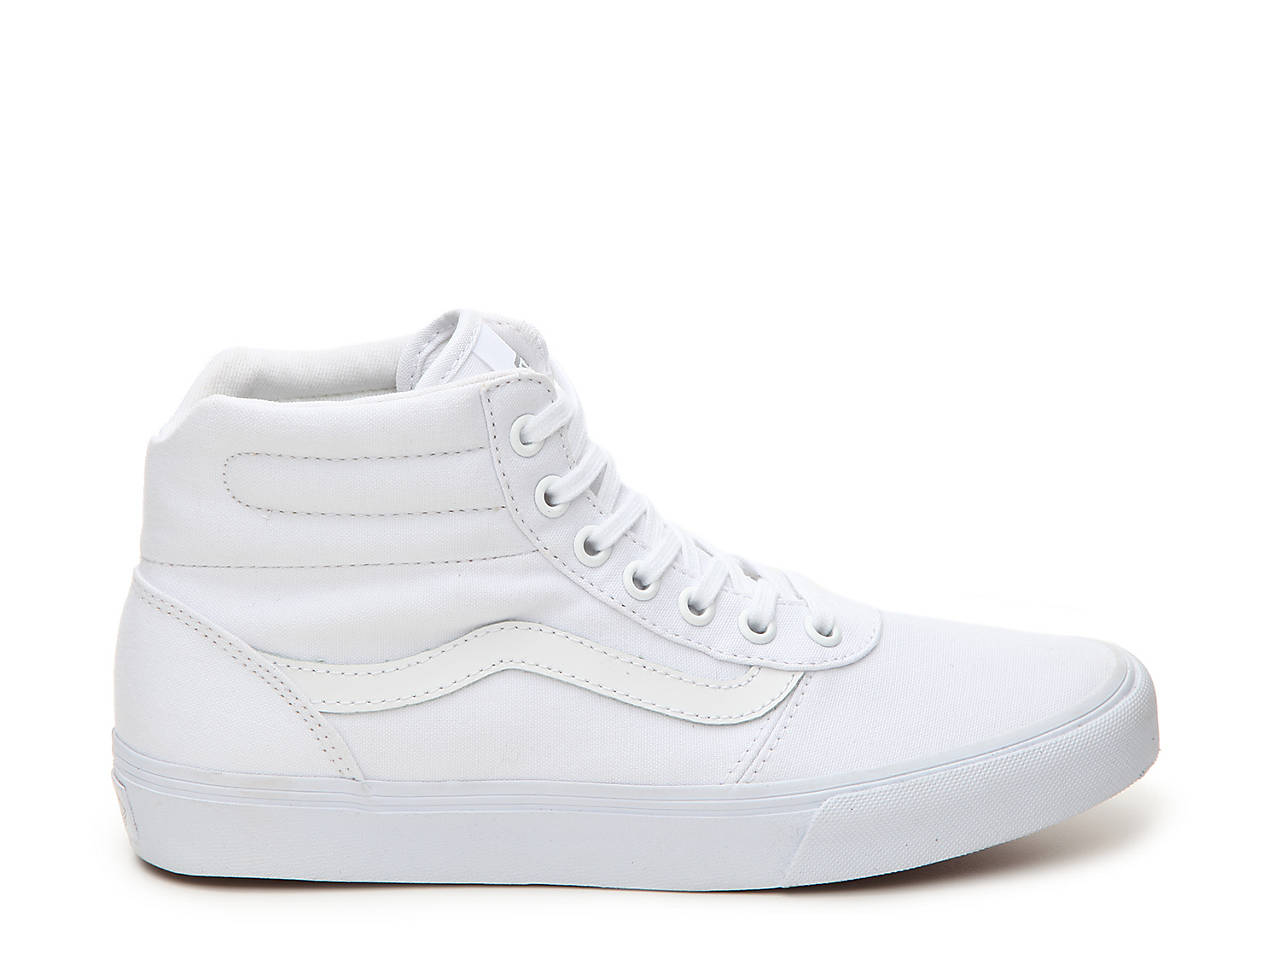 494b05c63d Vans Milton Hi Canvas High-Top Sneaker Men s Shoes